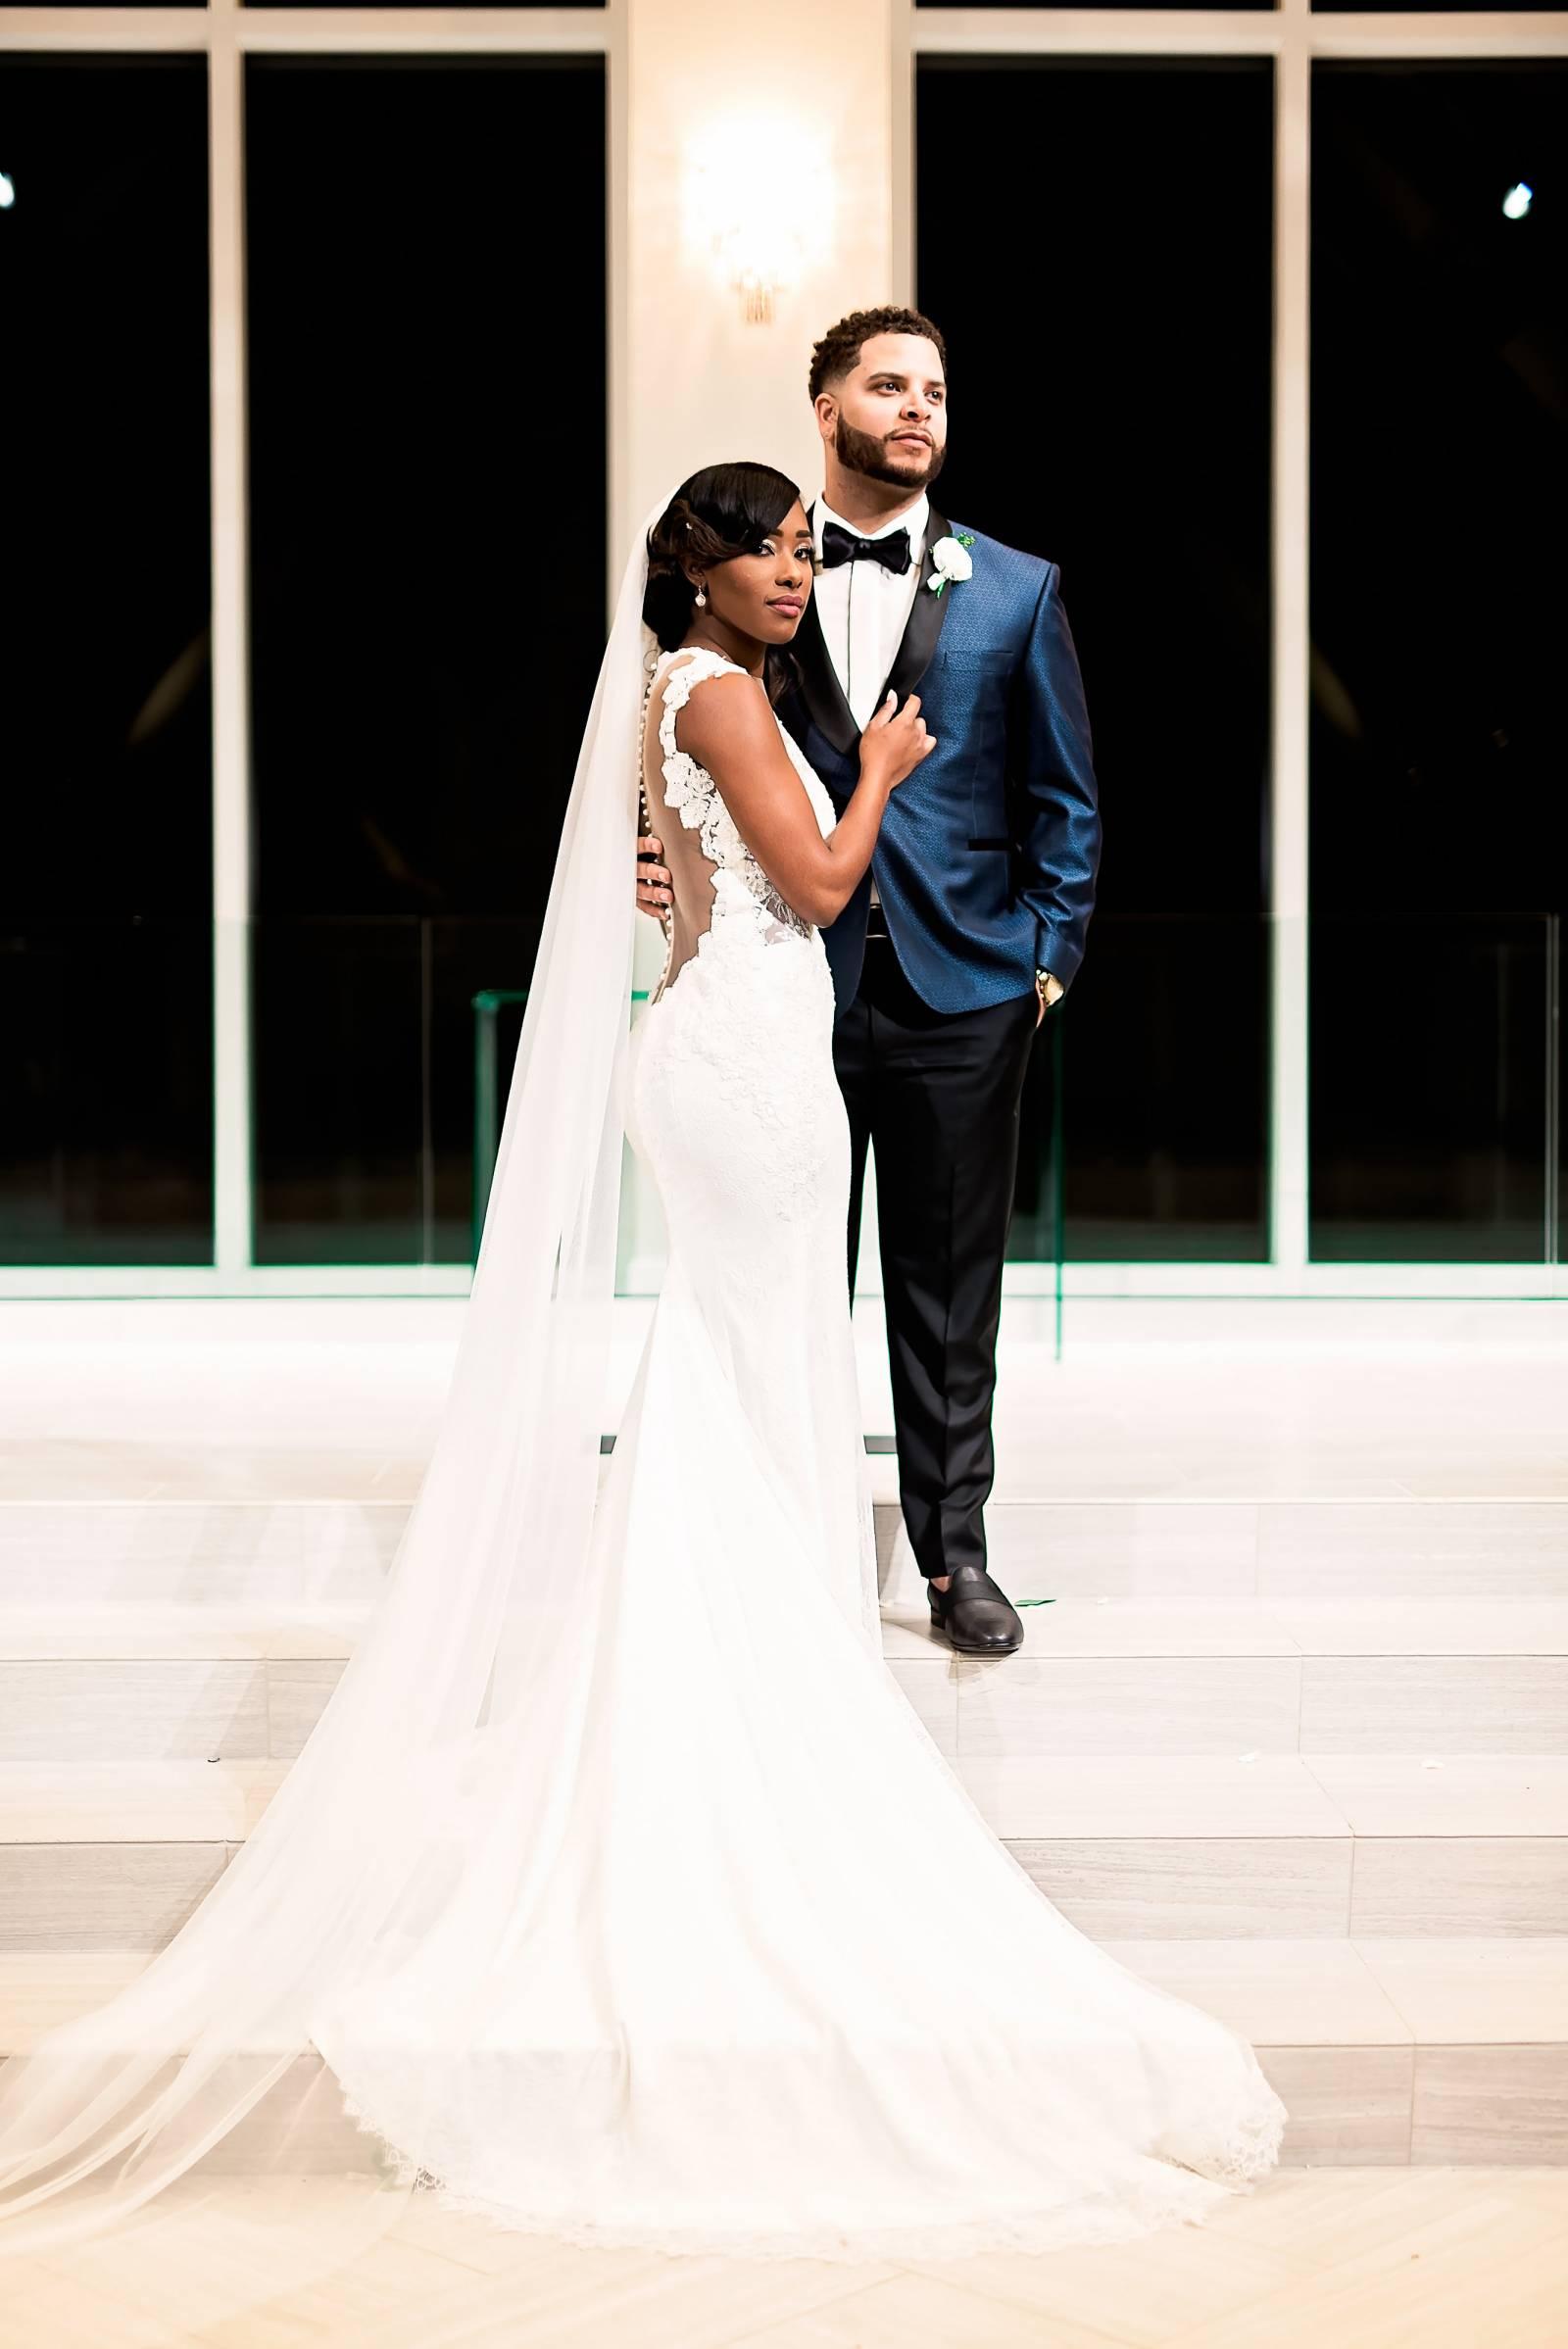 DeShana + Darryl Featured on the Black Bride - 2.0 - 3.jpg